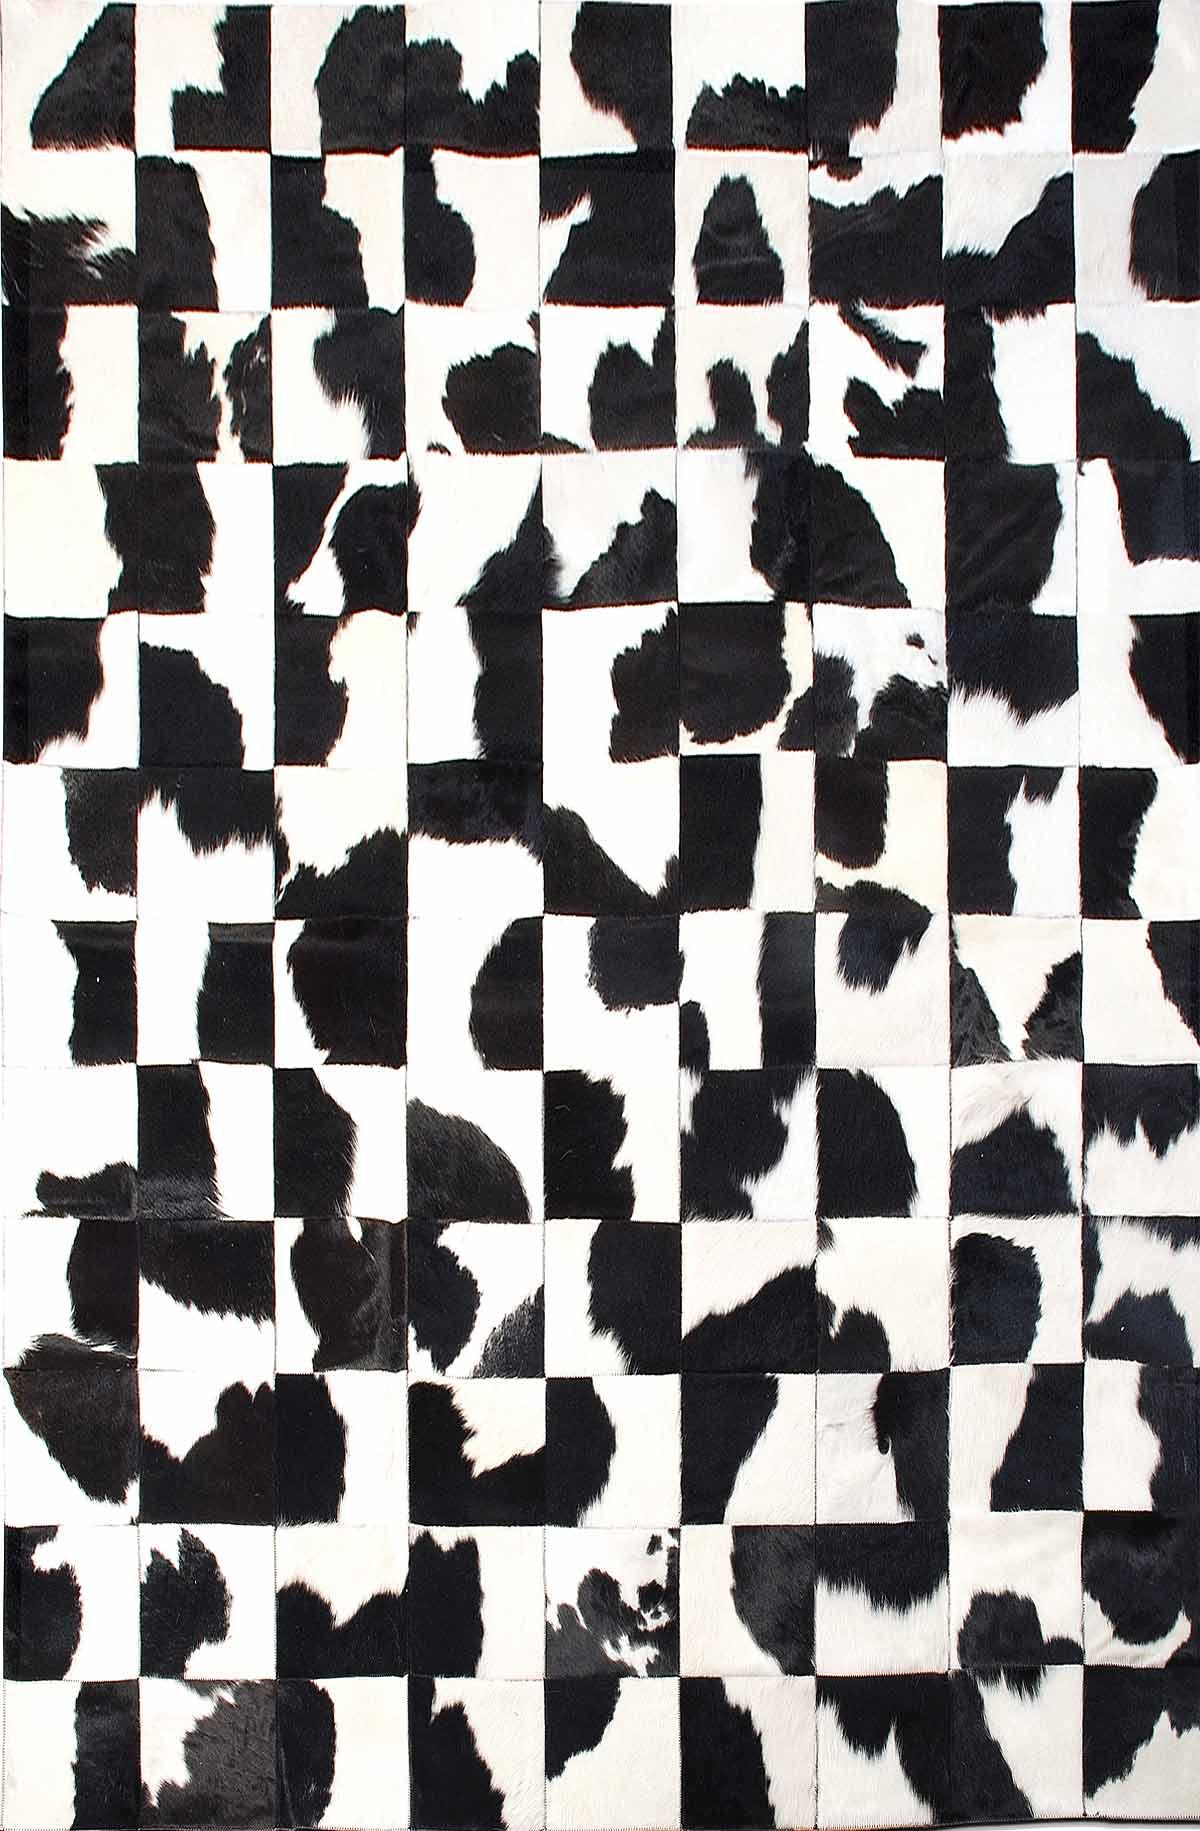 modern black area rug ... classic-black-white-modern-leather-area-rug.jpg ... PXZNUTU